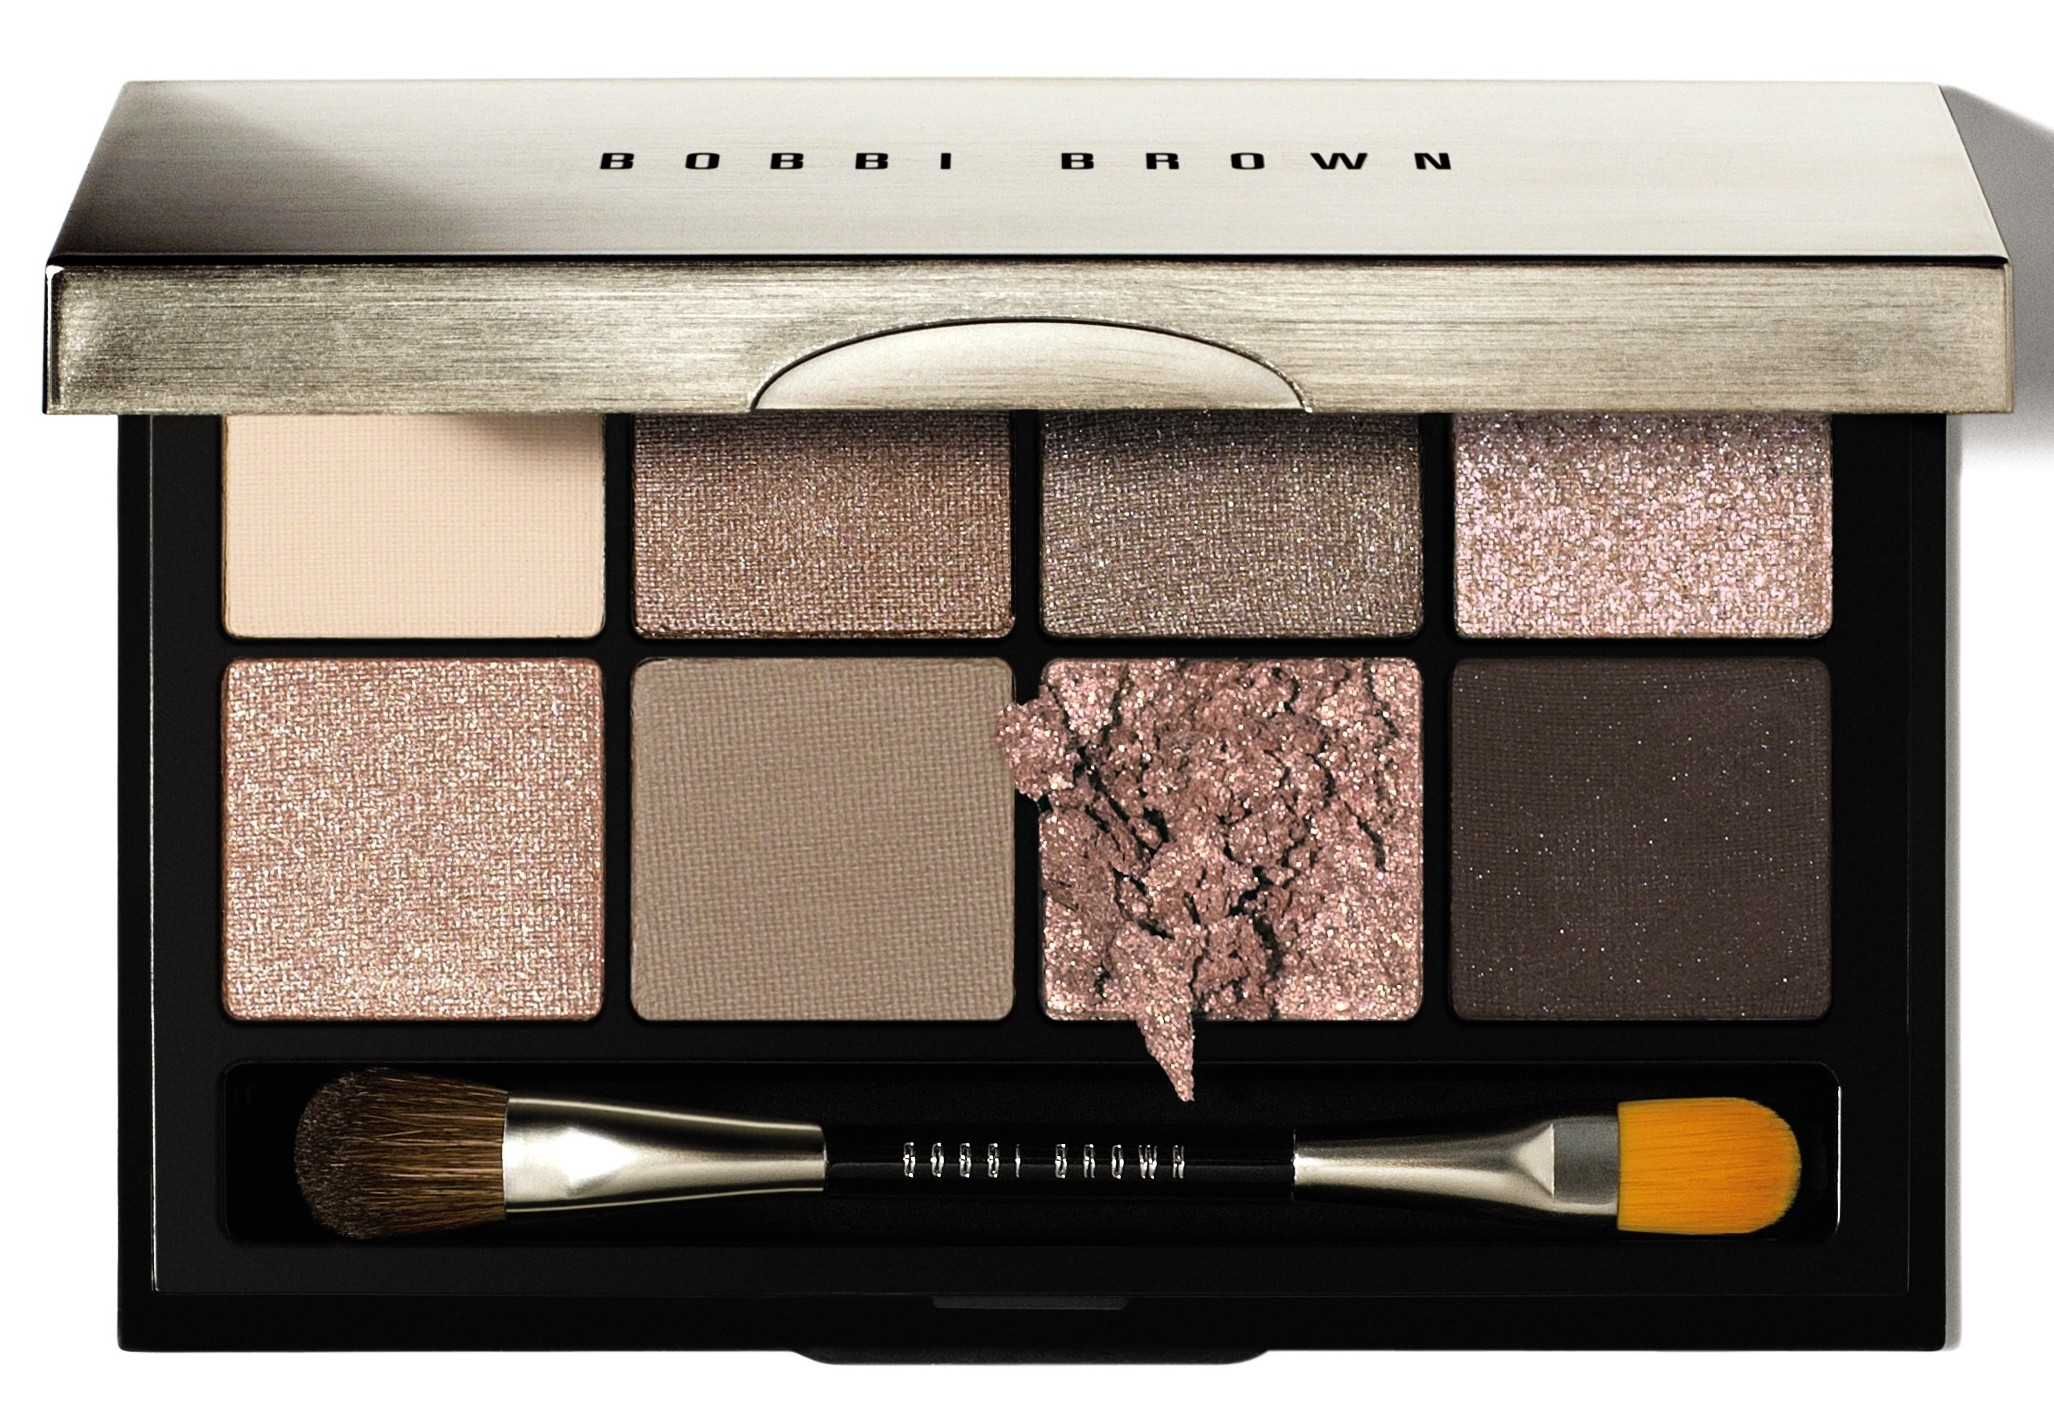 Bobbi Brown Desert Twilight Yummy Mummy Beauty Illuminating Cheek Palette Limited Edition The Eye